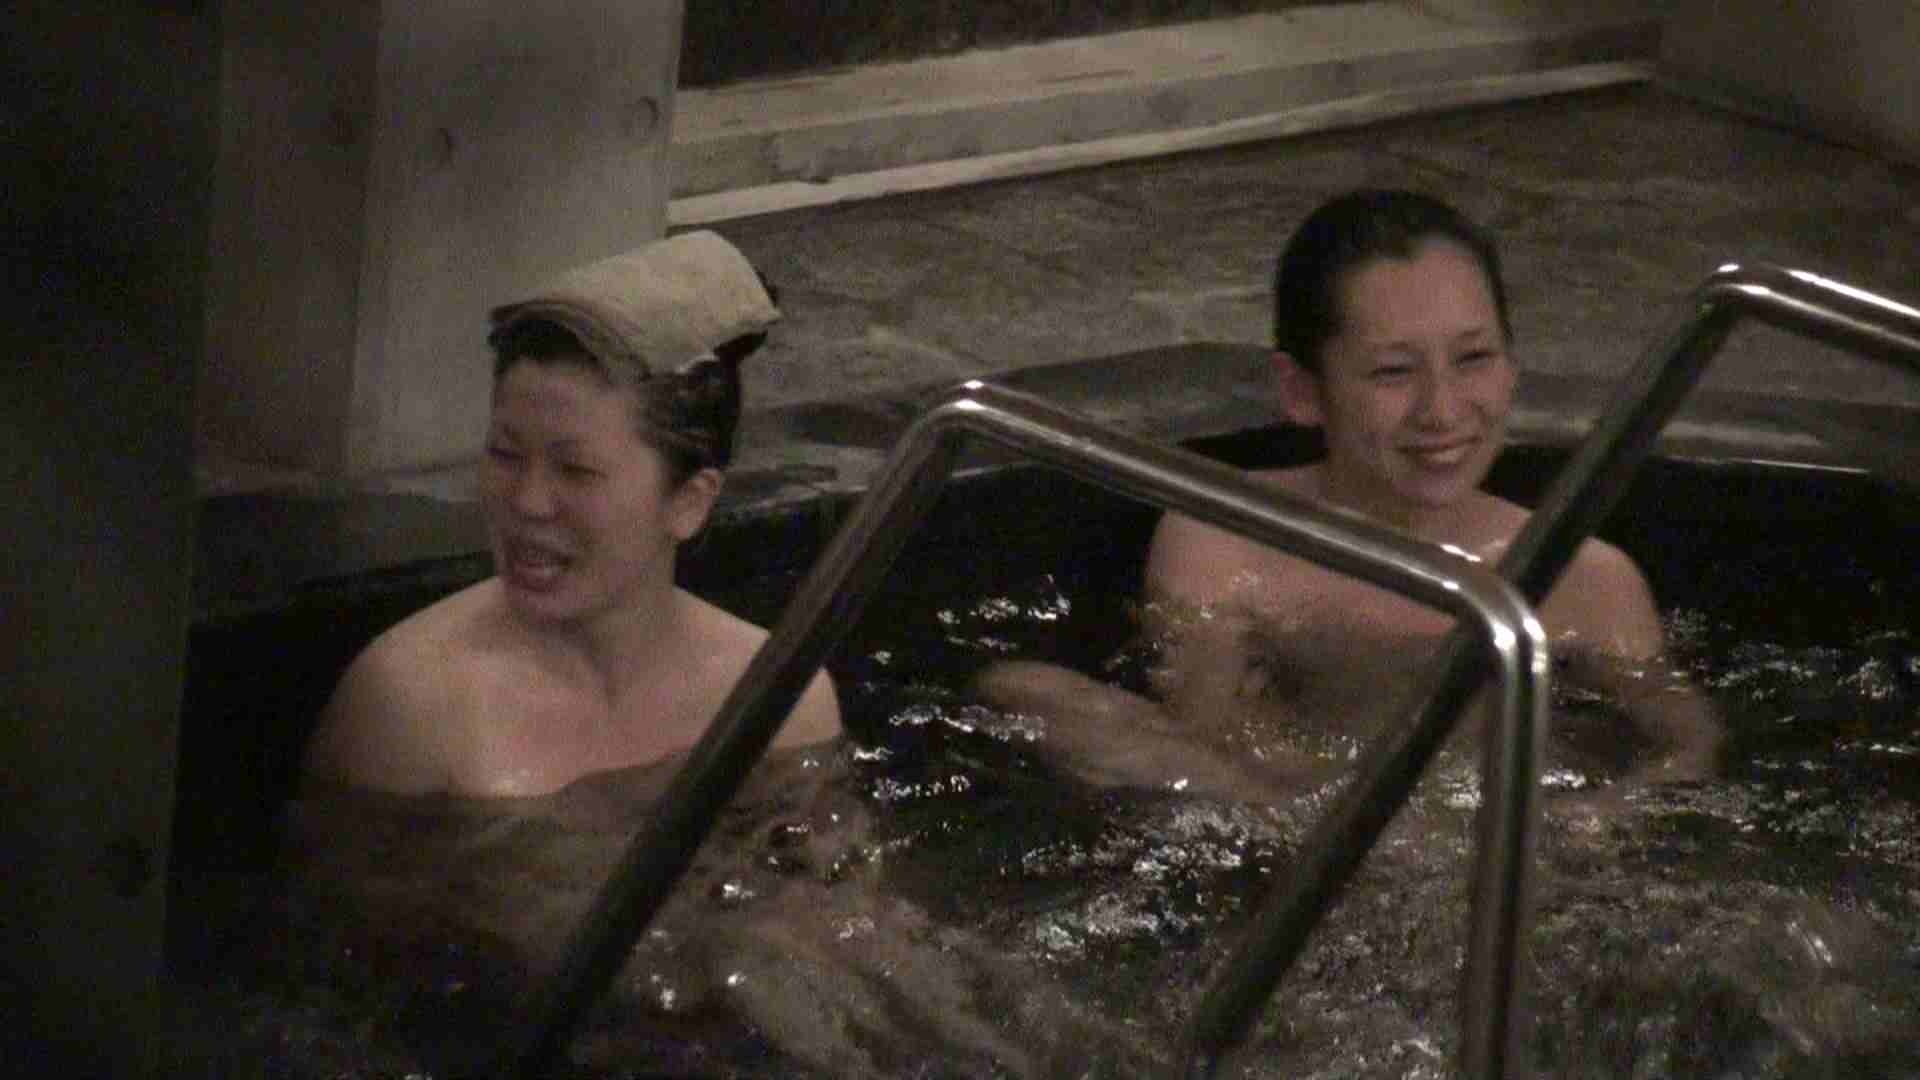 Aquaな露天風呂Vol.359 盗撮師作品  94pic 72